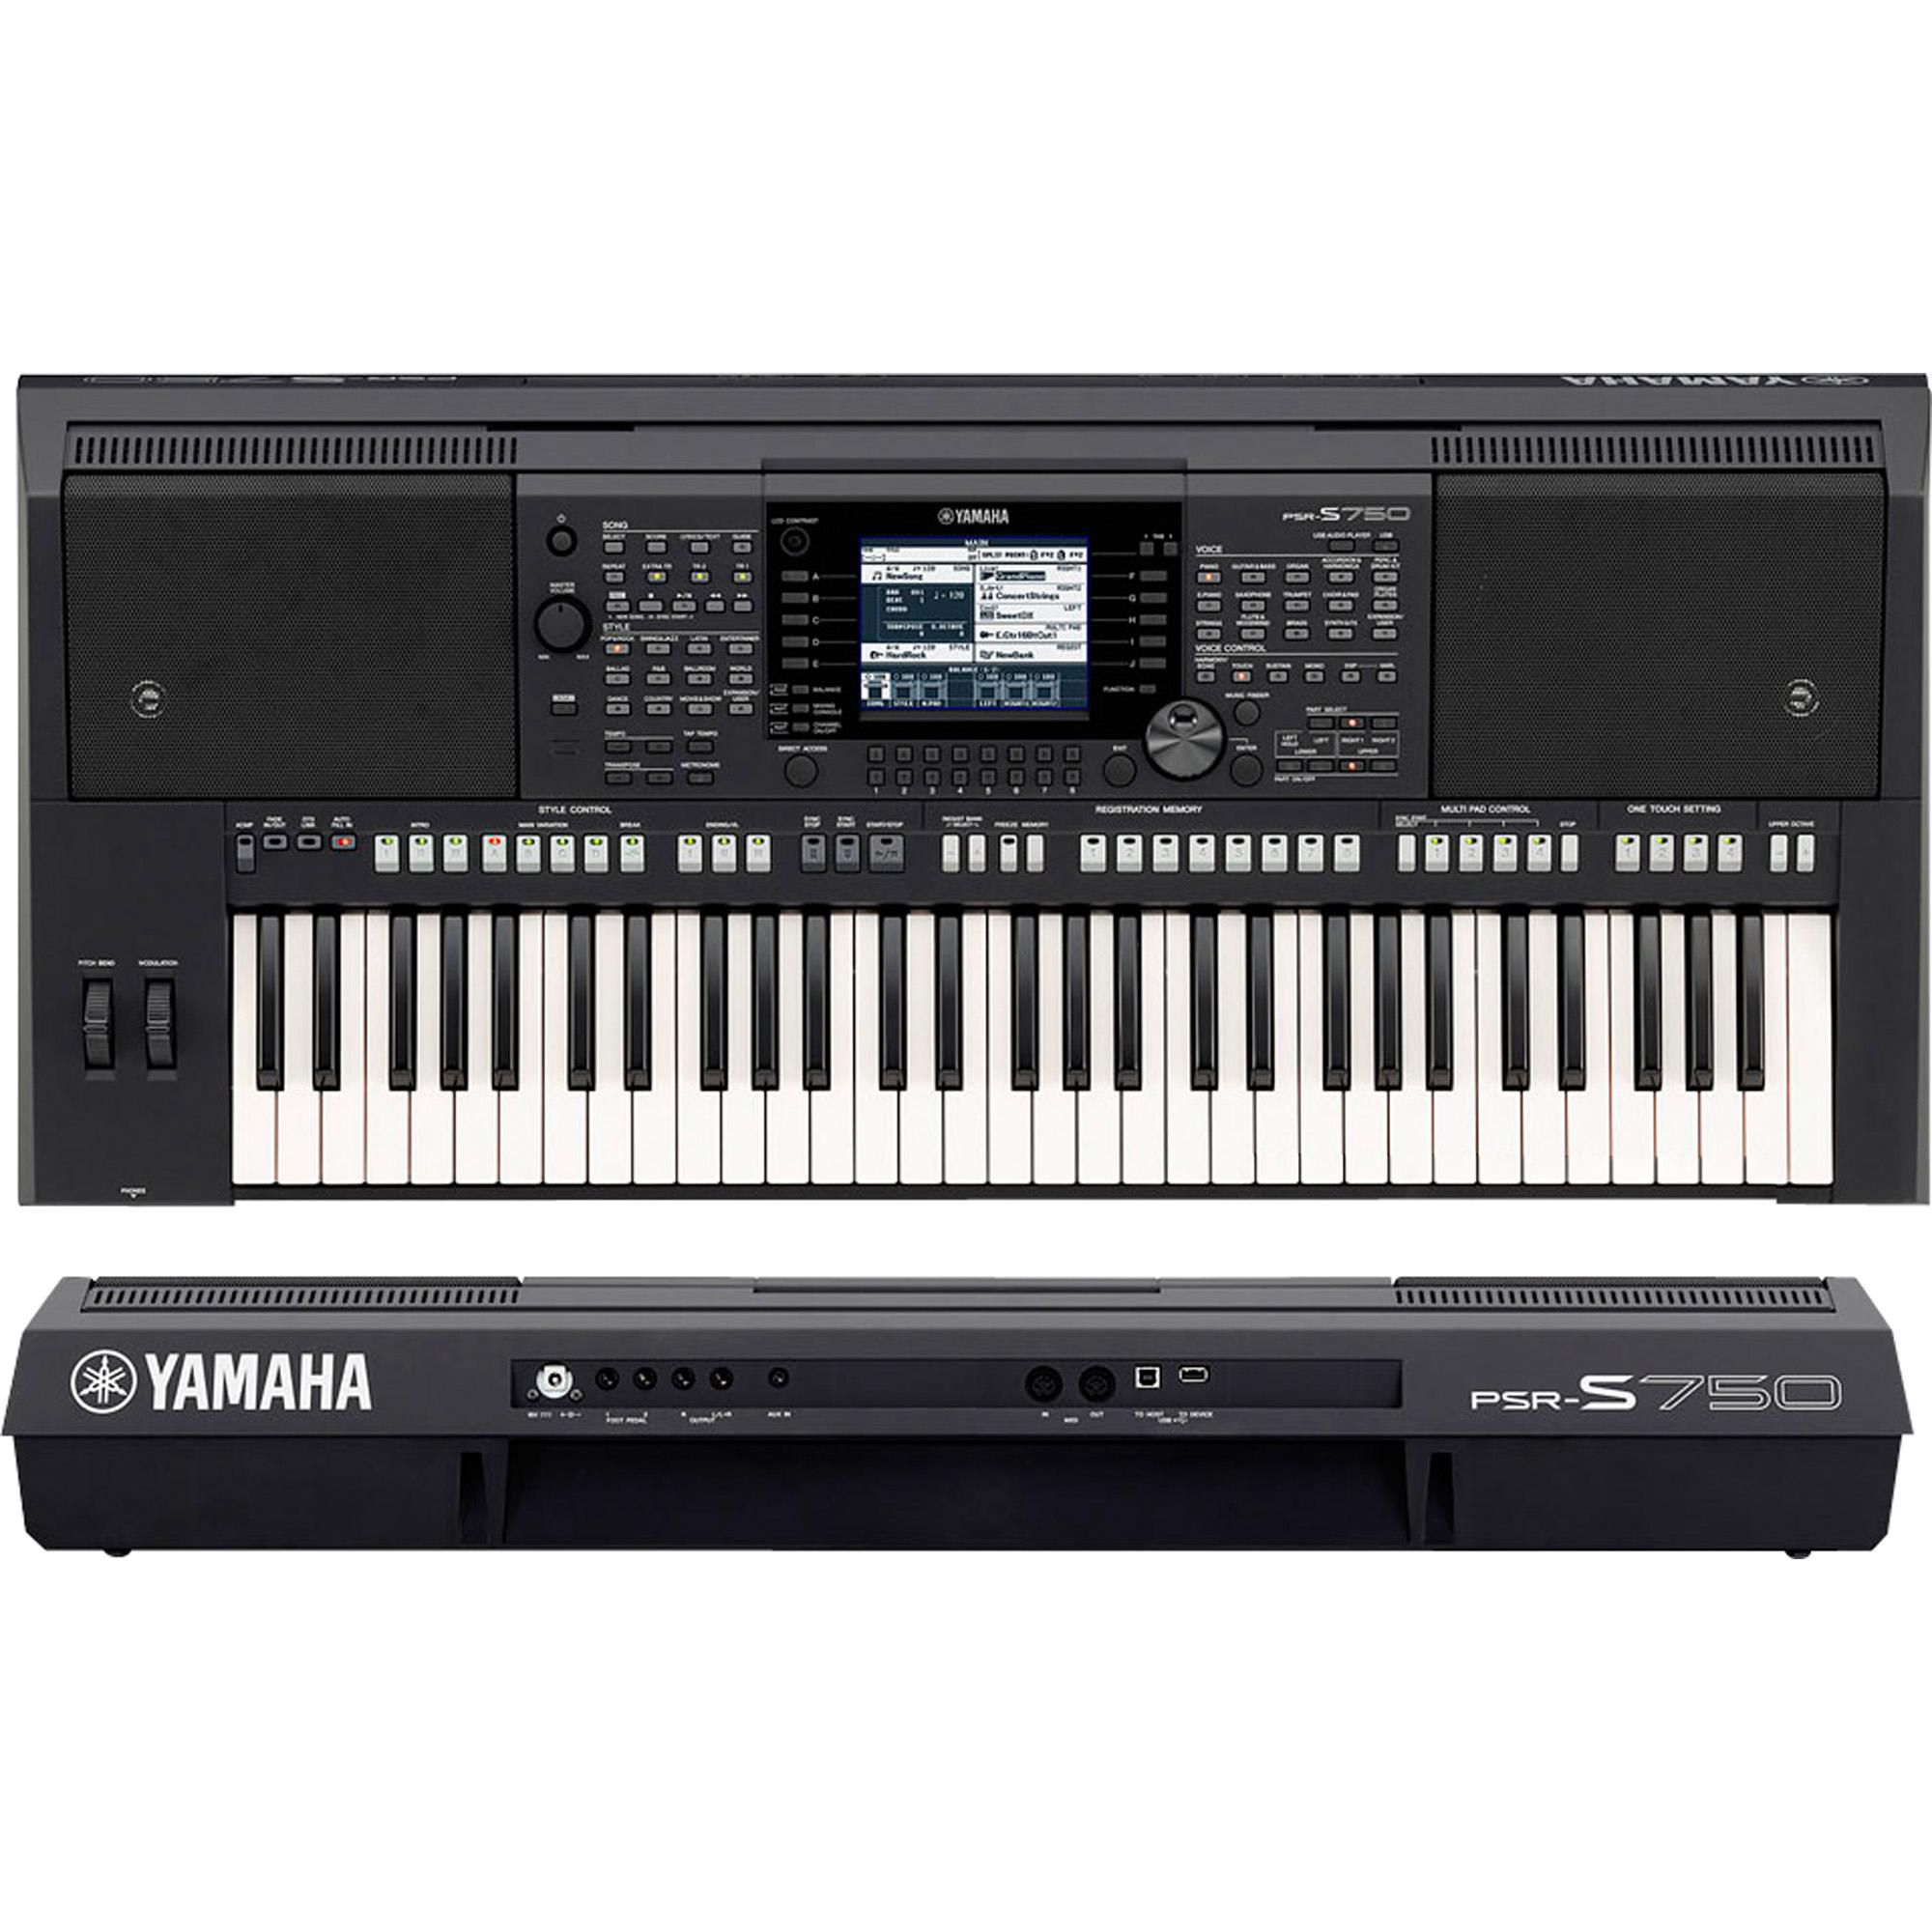 Teclado Yamaha Psr S750  - Luggi Instrumentos Musicais